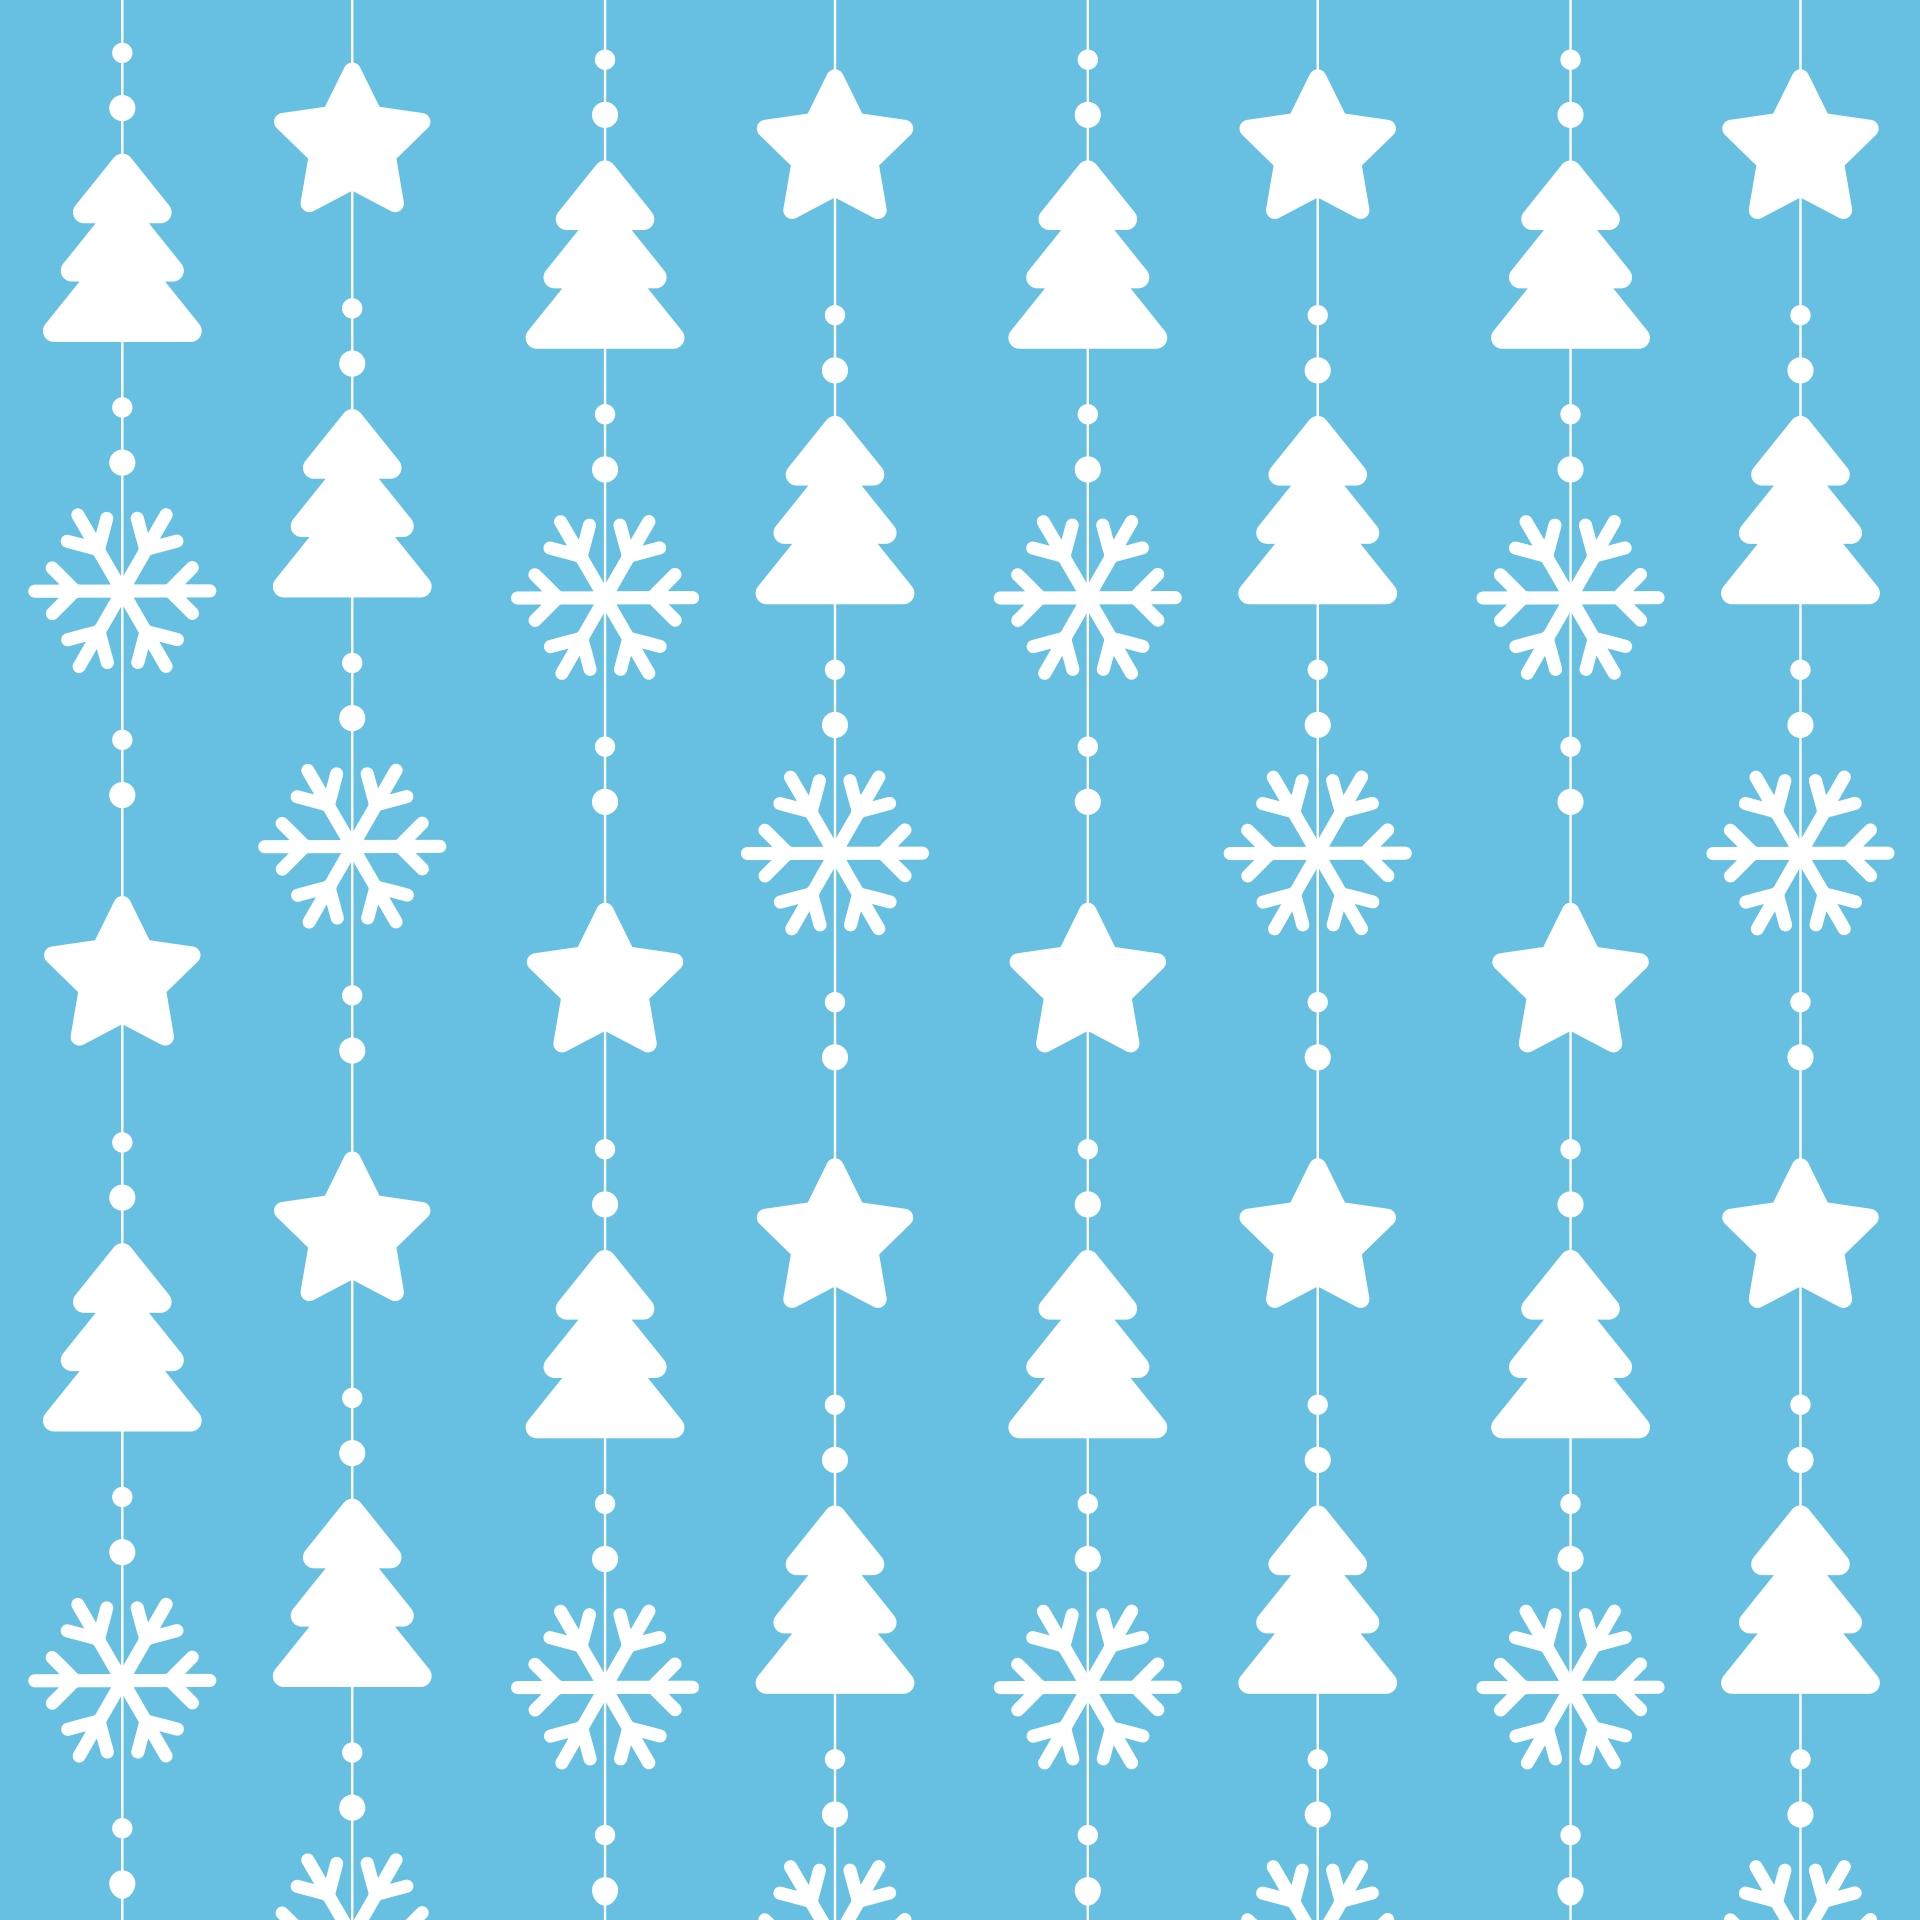 Christmas Ornament Patterns